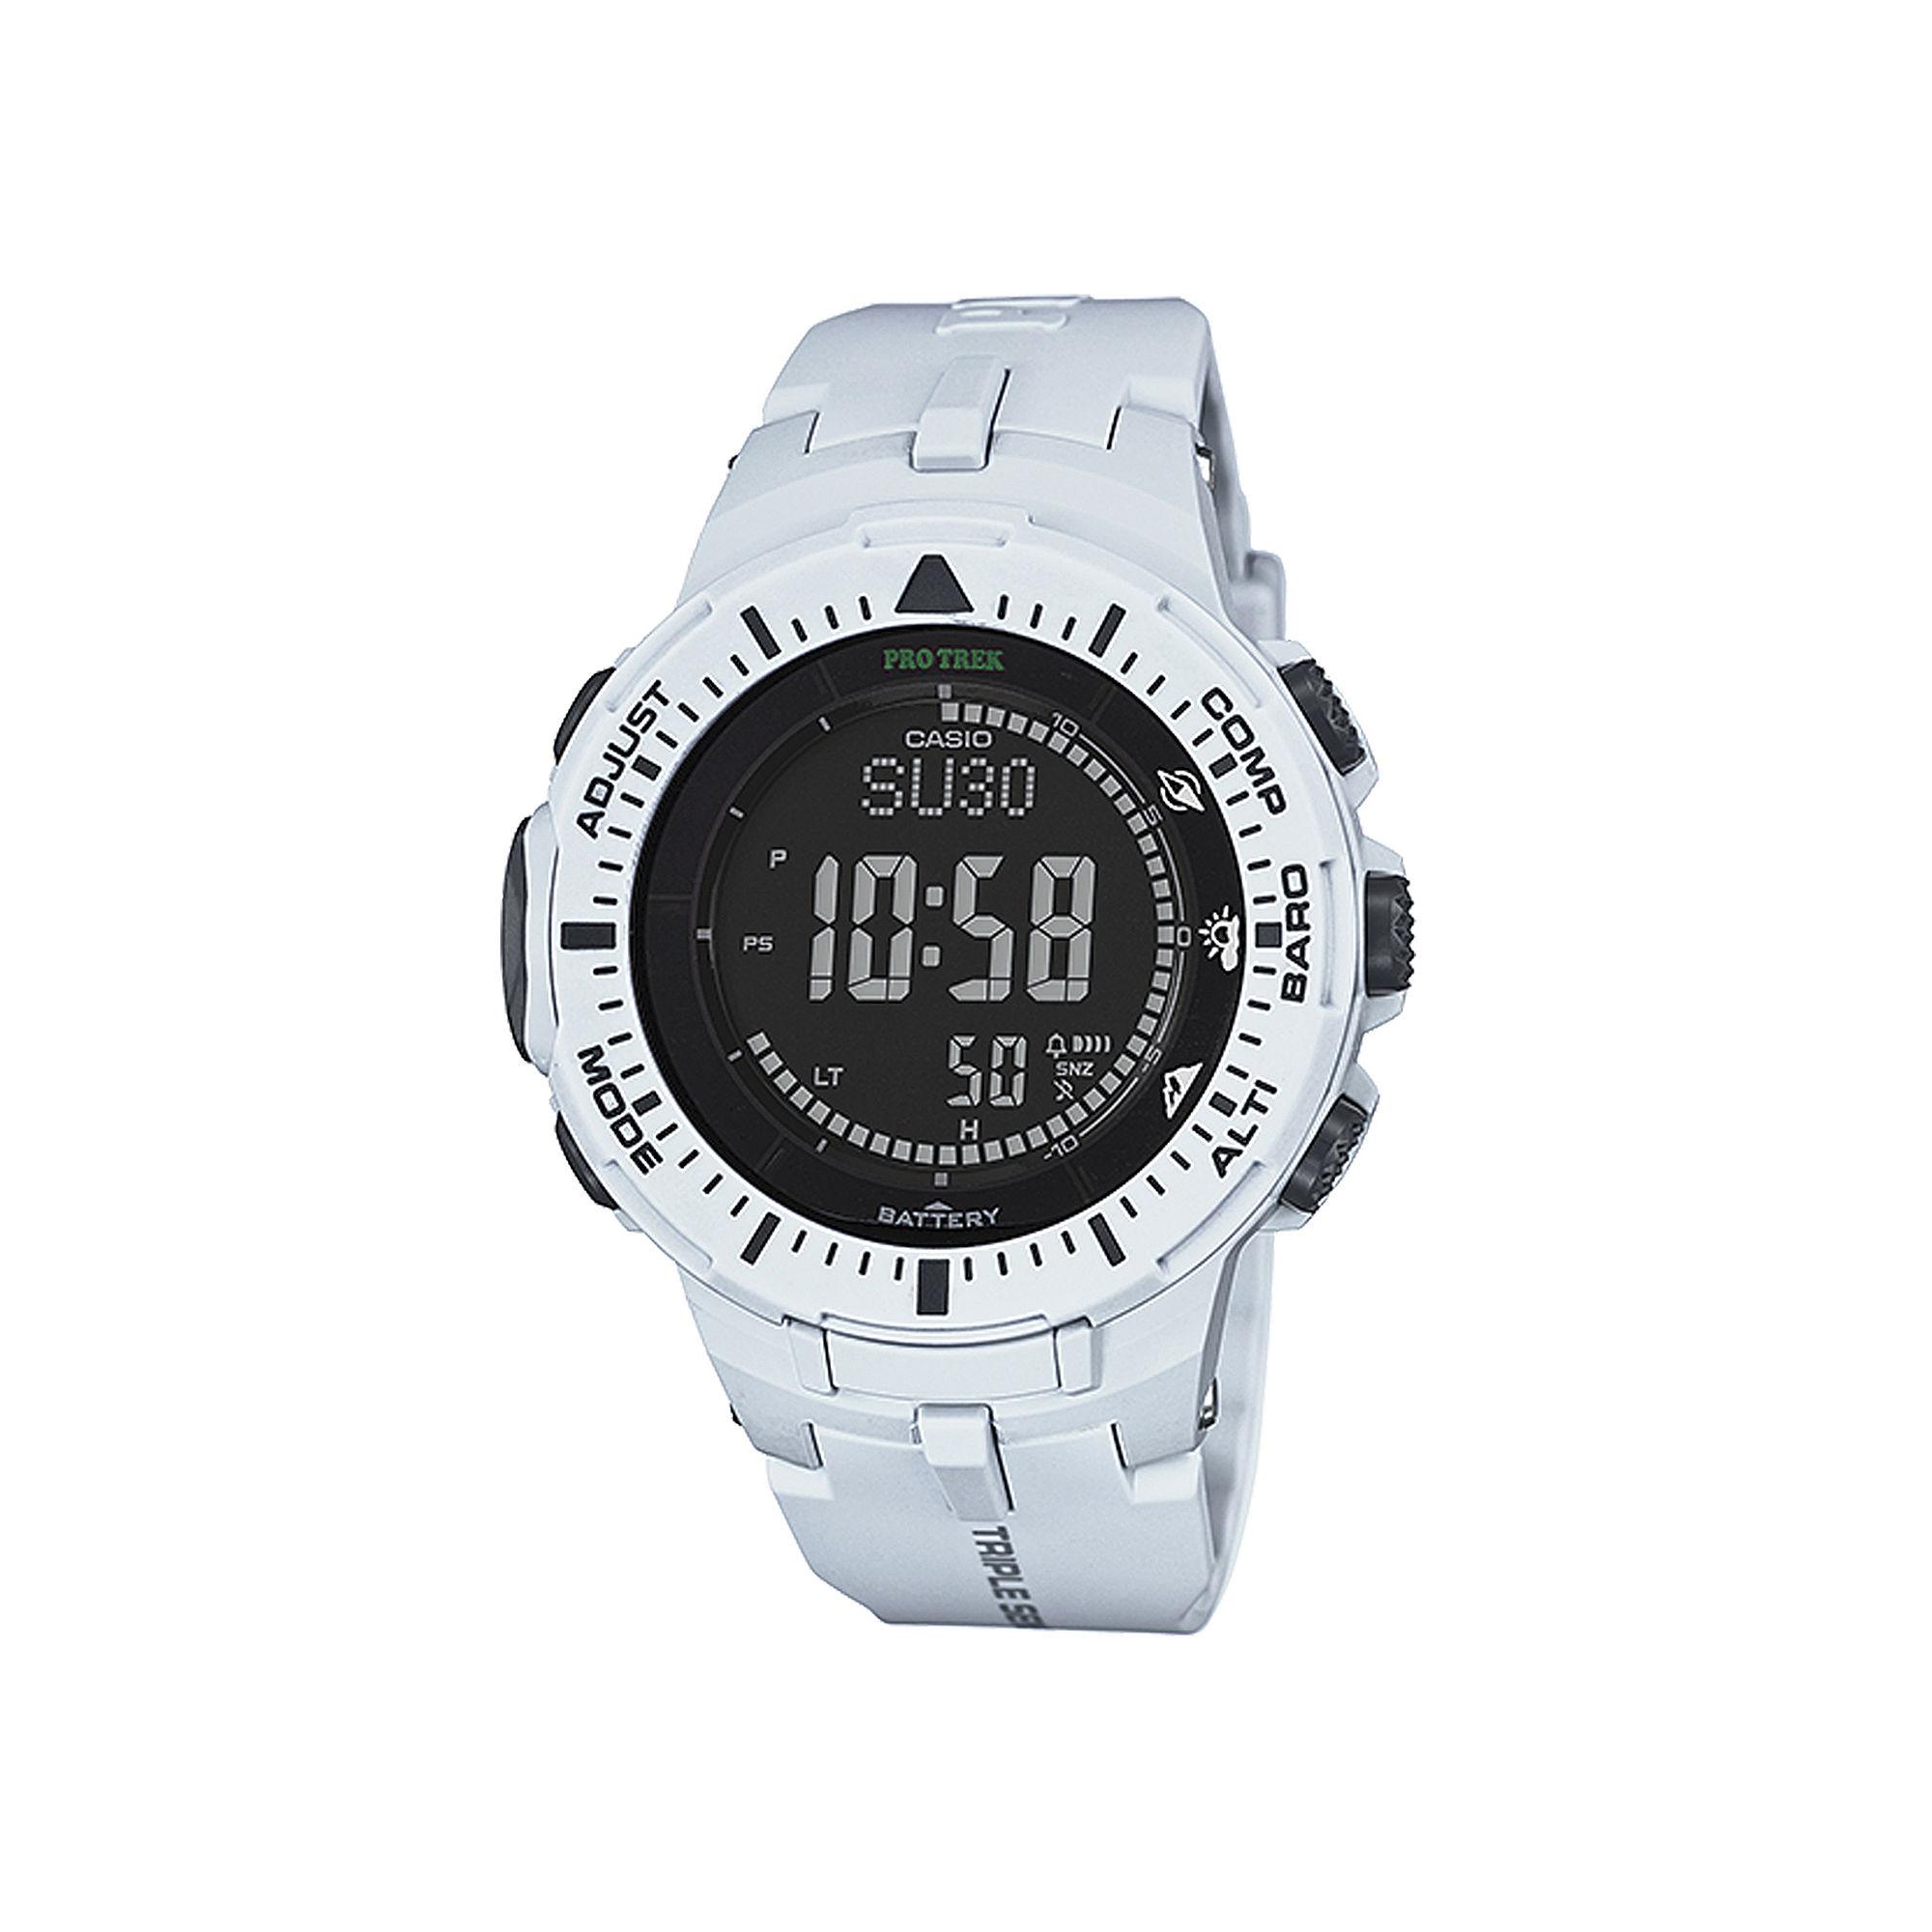 Casio Pro Trek Tough Solar Triple Sensor Mens World Time Watch PRG300-7CR